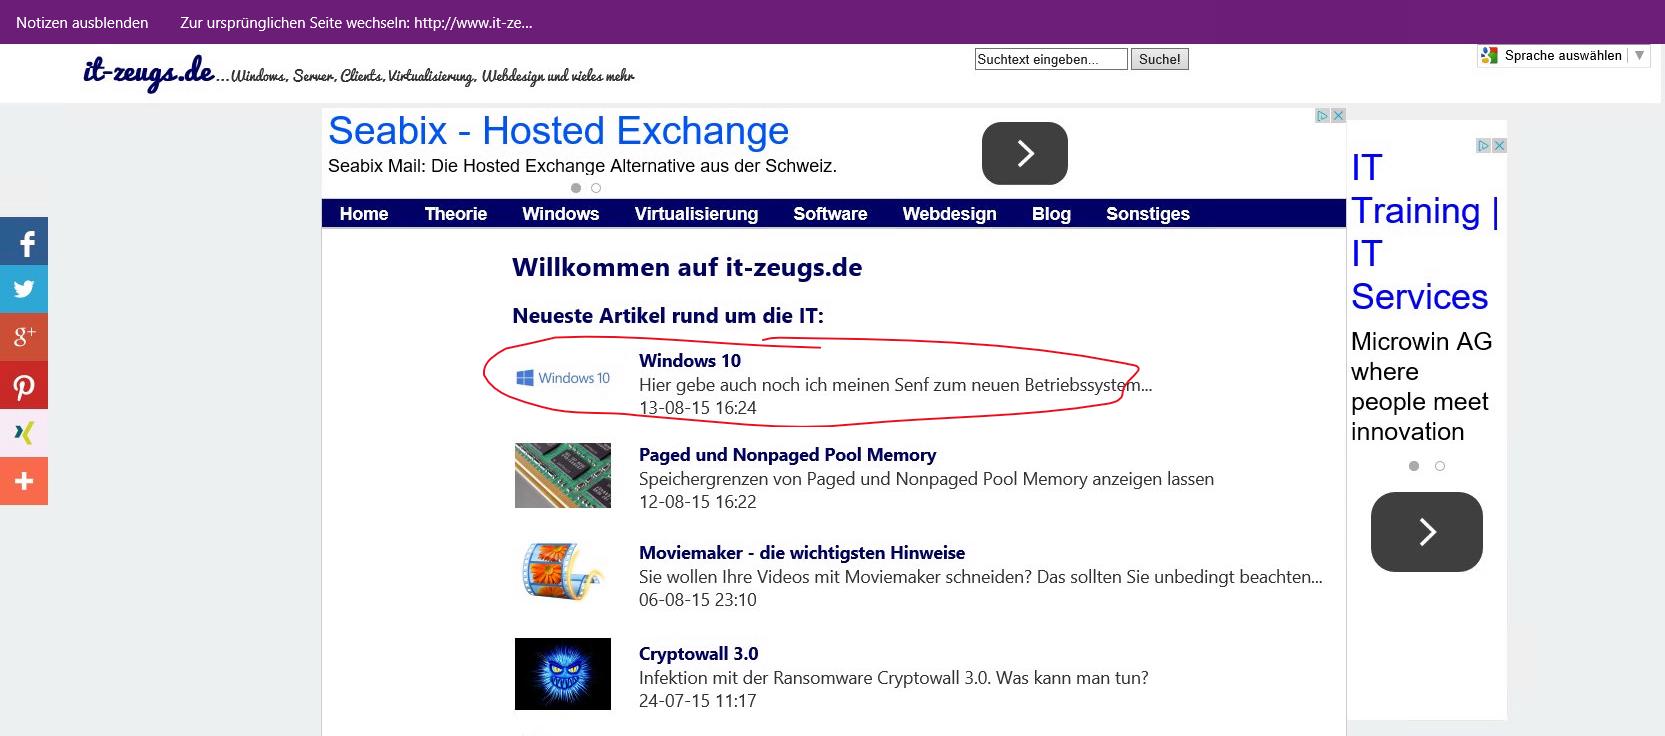 Windows 10 - Edge-Browser